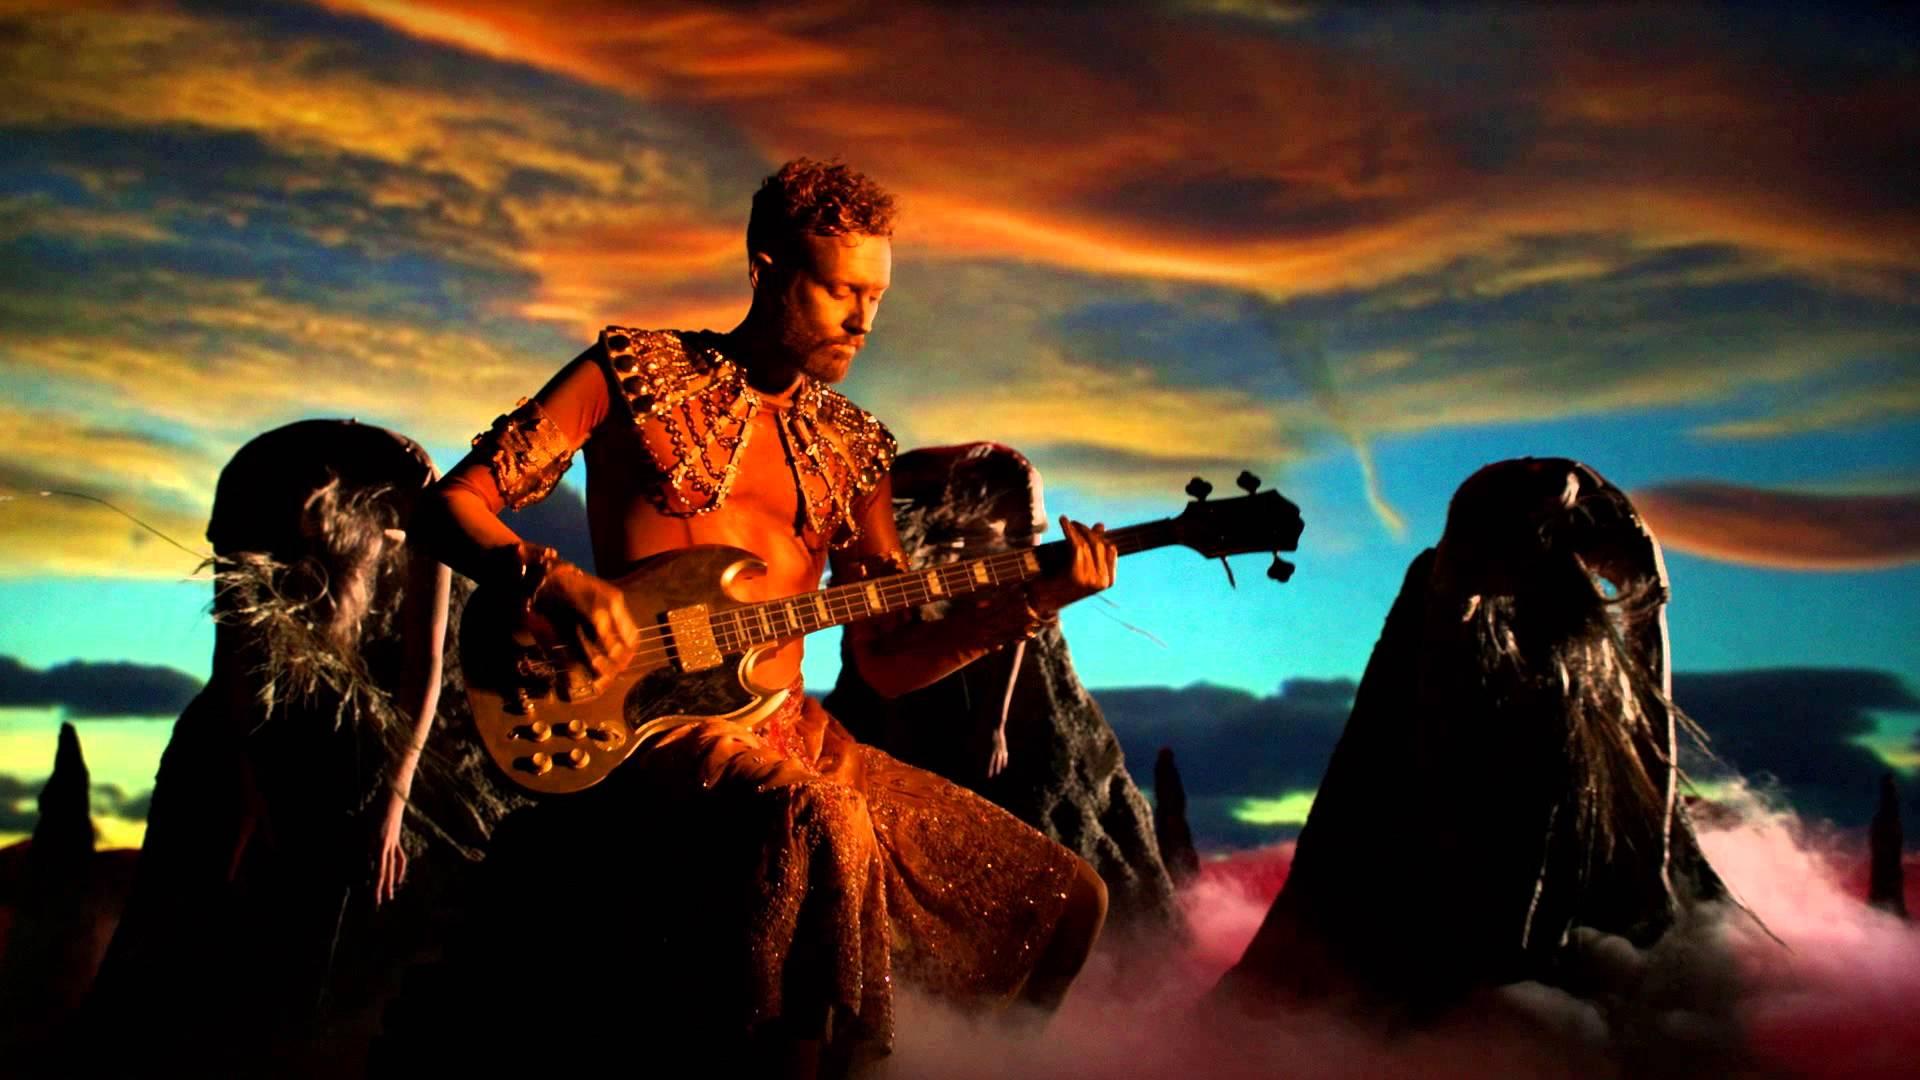 OneRepublic to return to Red Rocks Amphitheatre on Labor Day